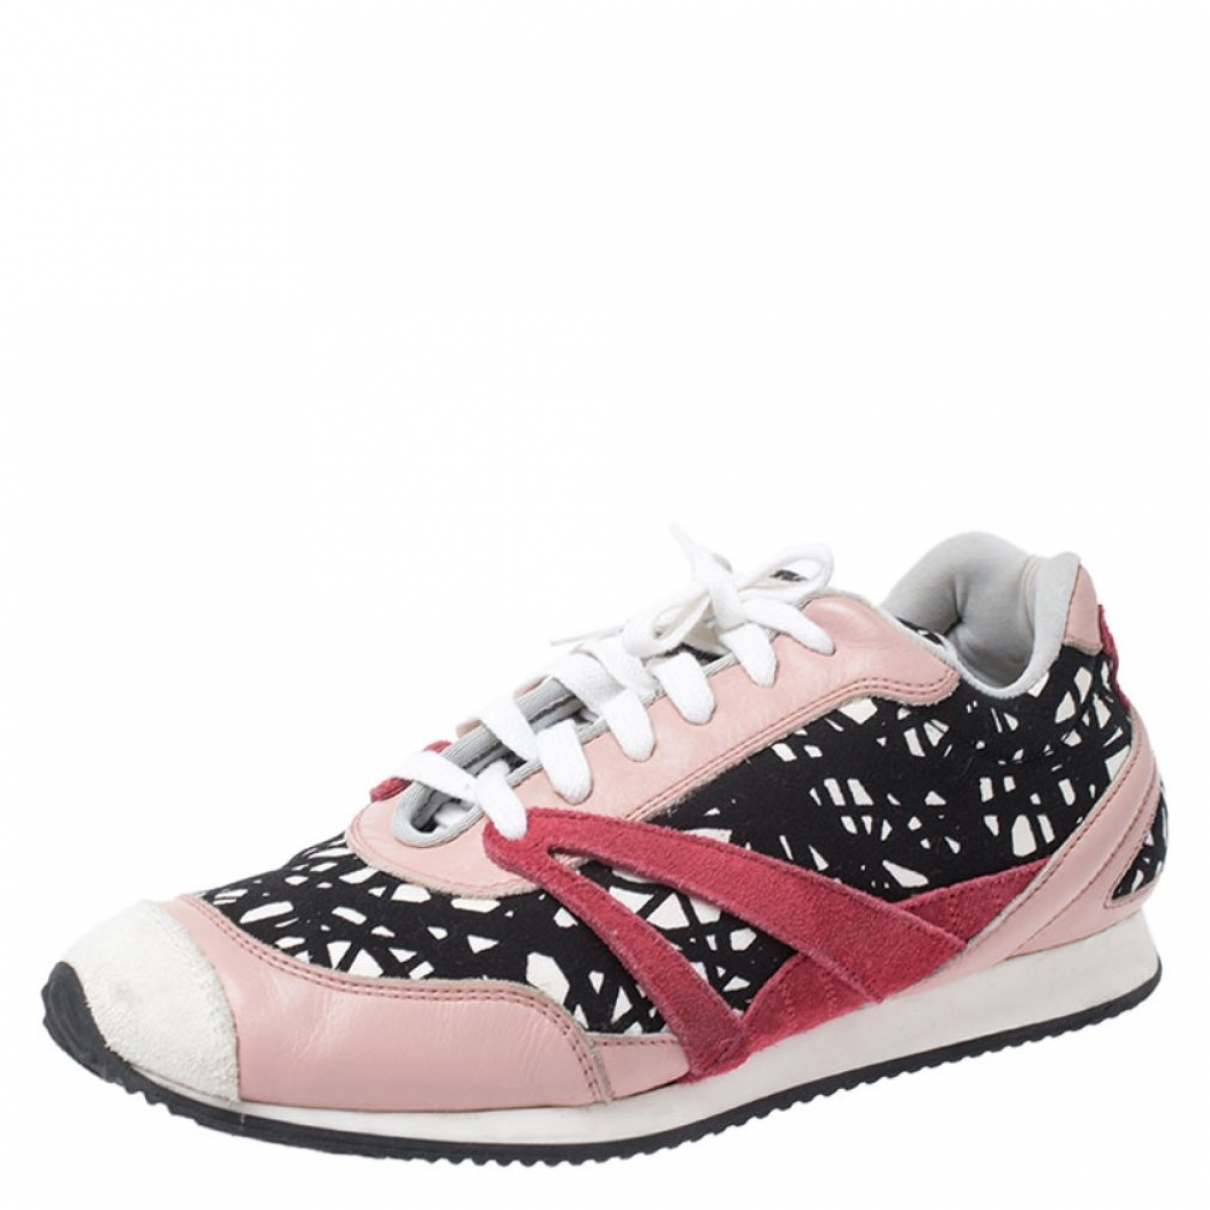 Balenciaga \N Sneakers in  Bunt Leinen